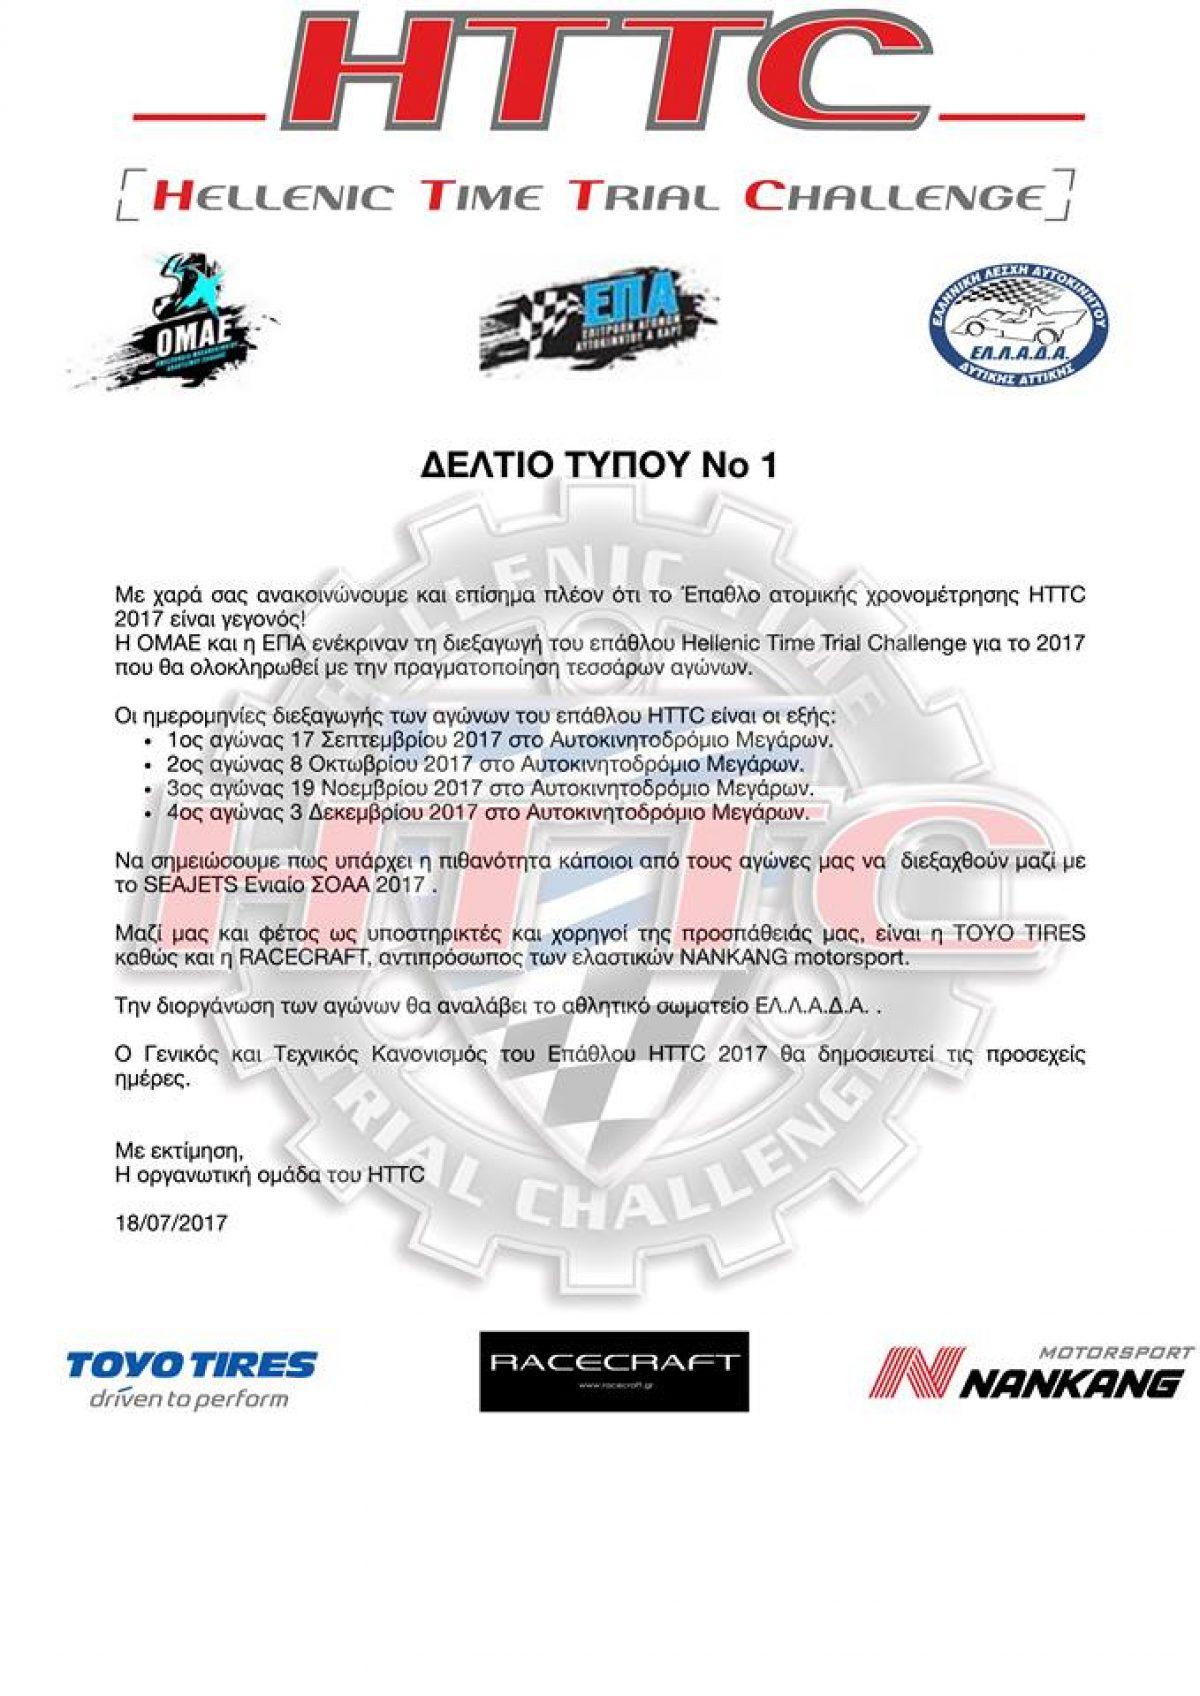 HTTC – Αγώνες ταχύτητας για καθημερινά αυτοκίνητα!